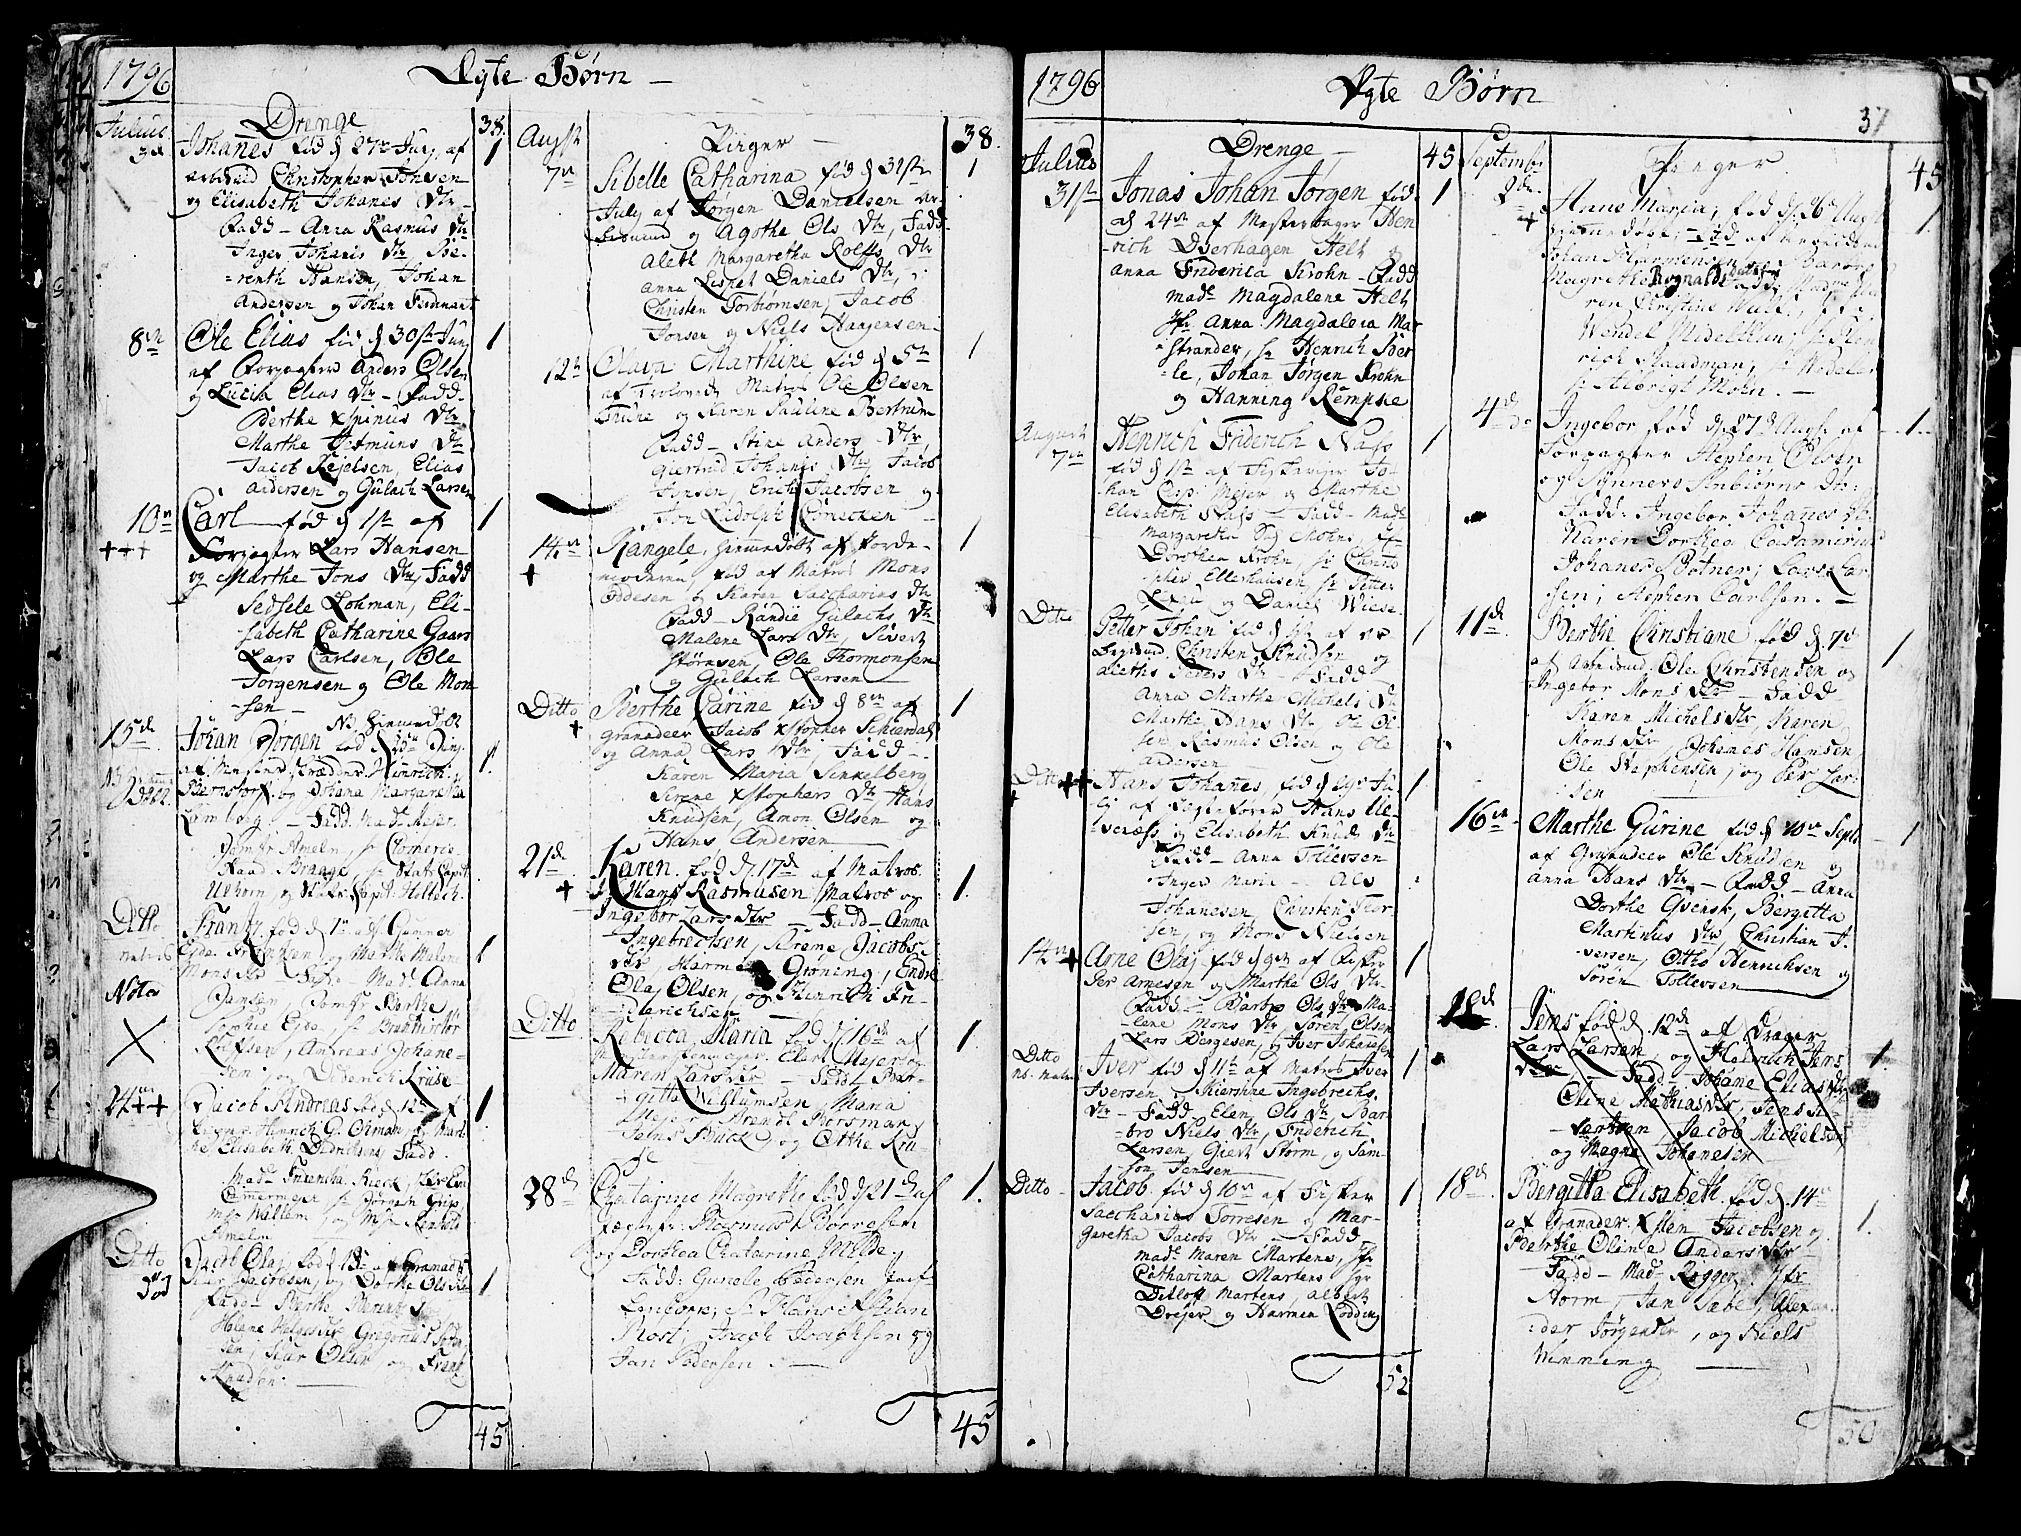 SAB, Korskirken Sokneprestembete, H/Haa/L0006: Ministerialbok nr. A 6, 1790-1820, s. 37